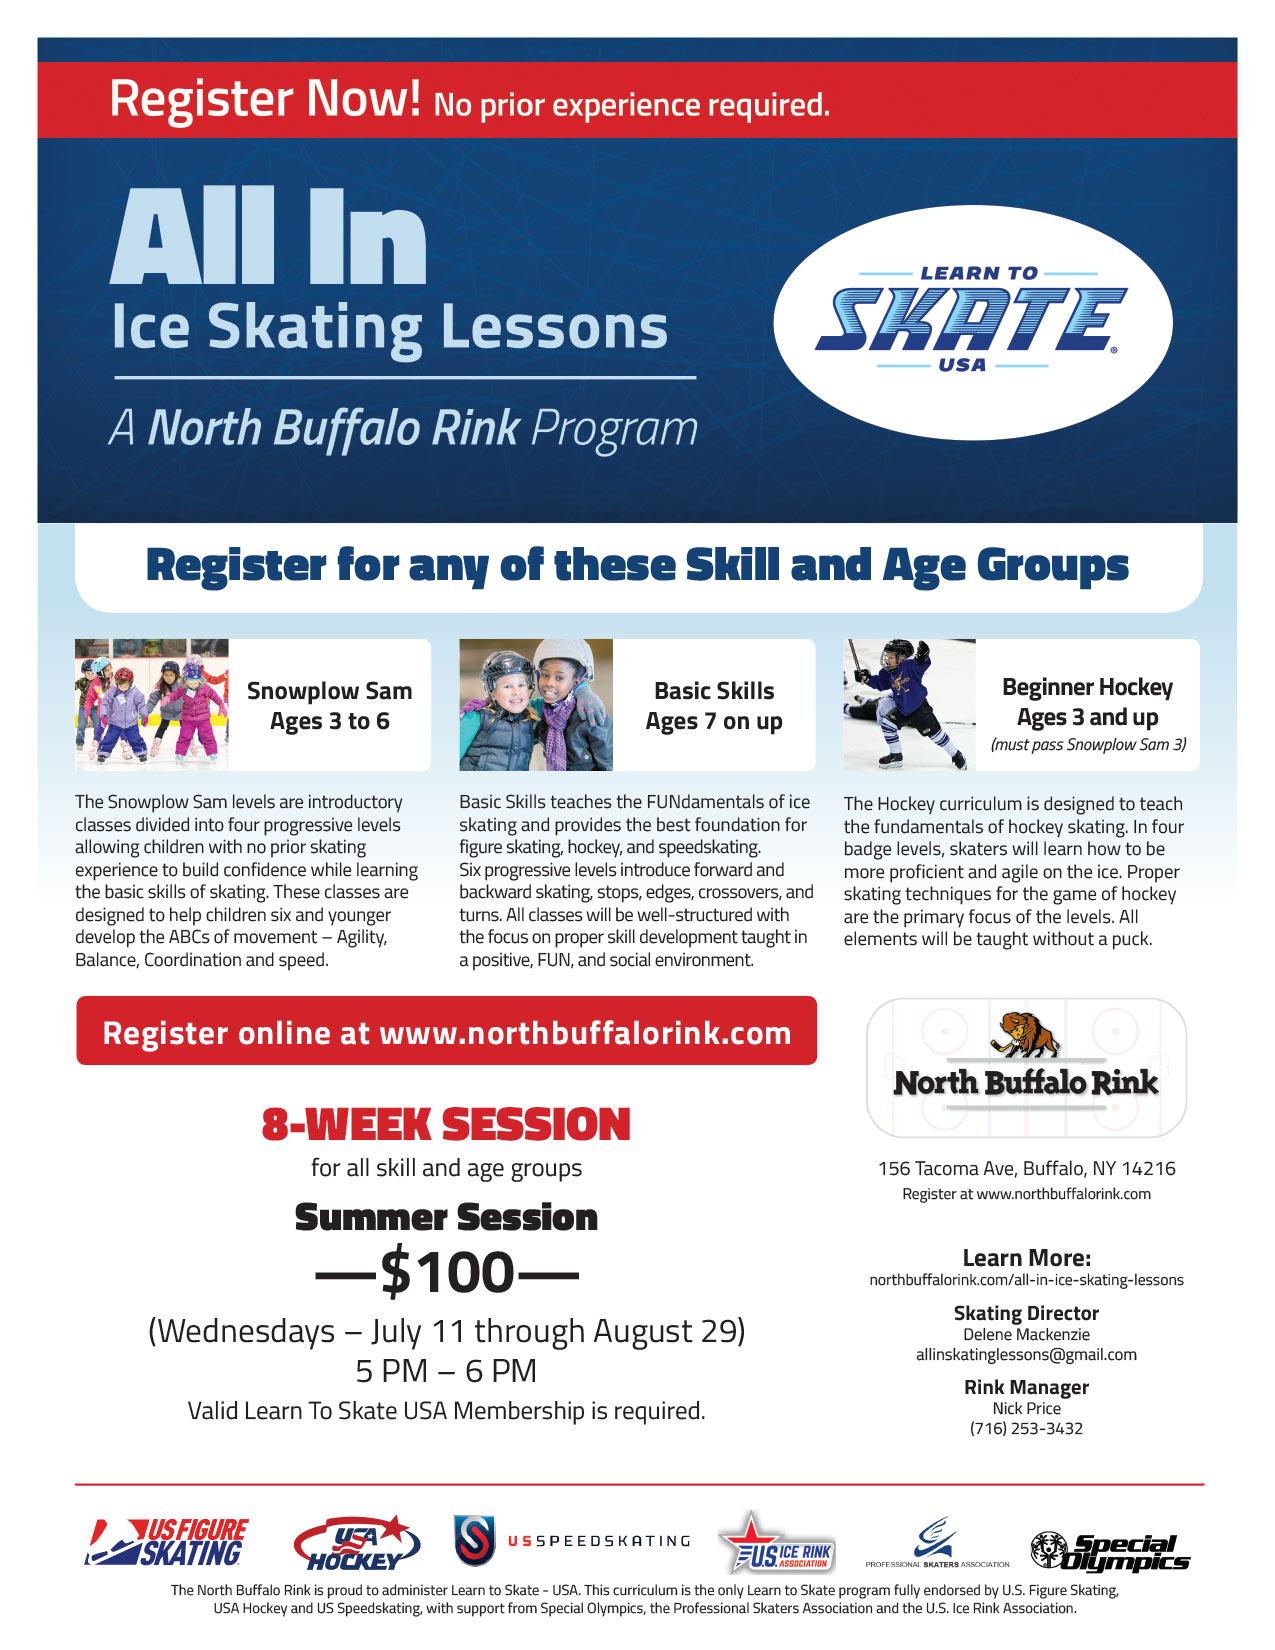 All In Ice Skating Lesson - Summer Program at North Buffalo Rink